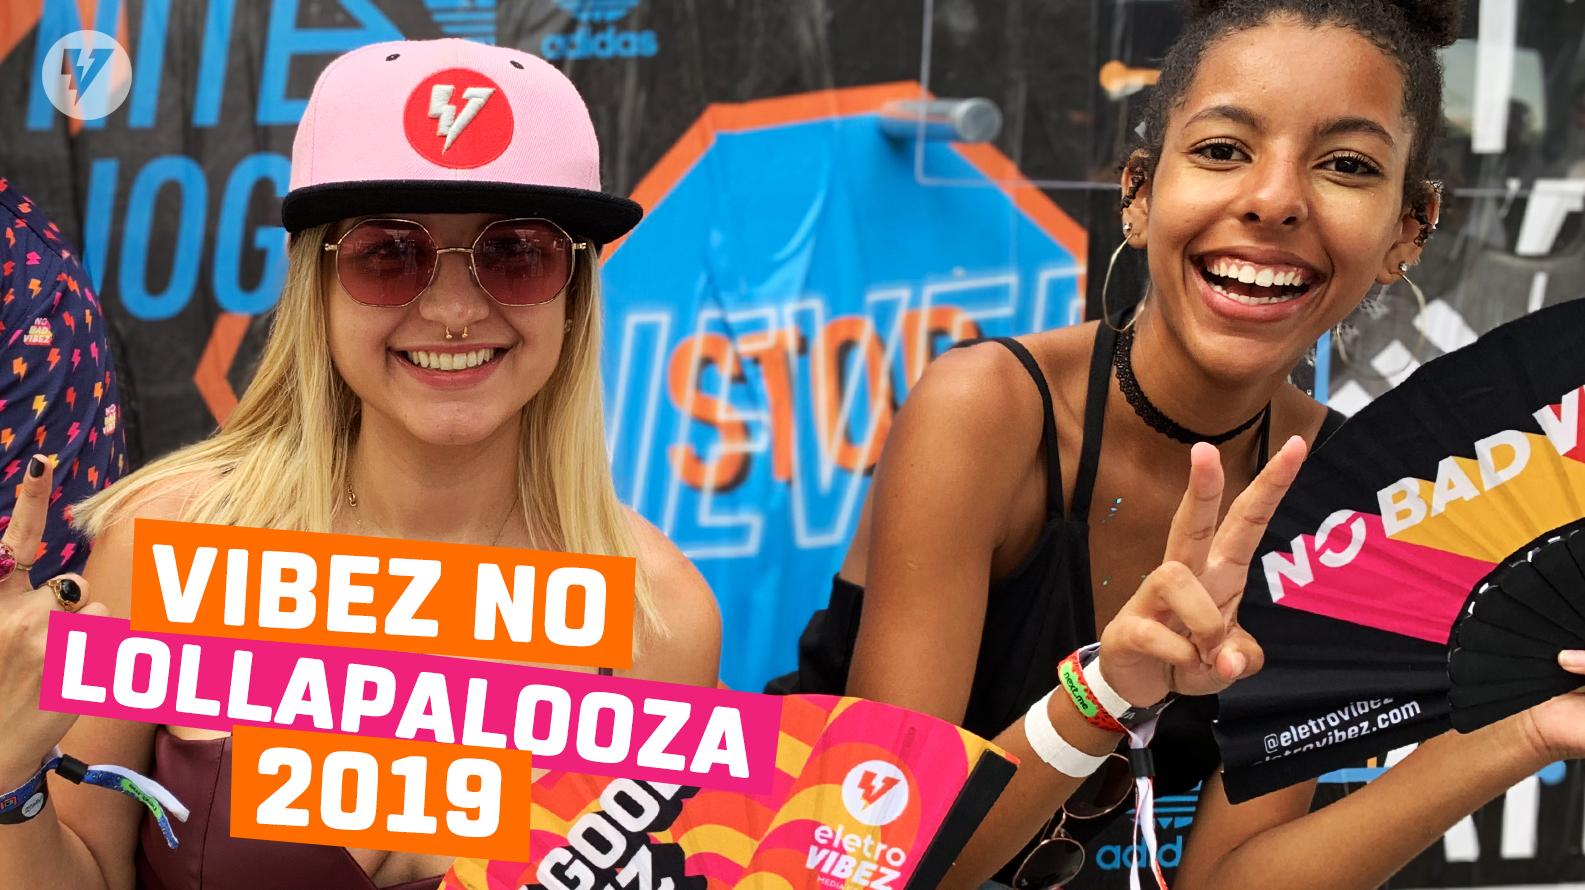 miniatura lollapalooza 2019